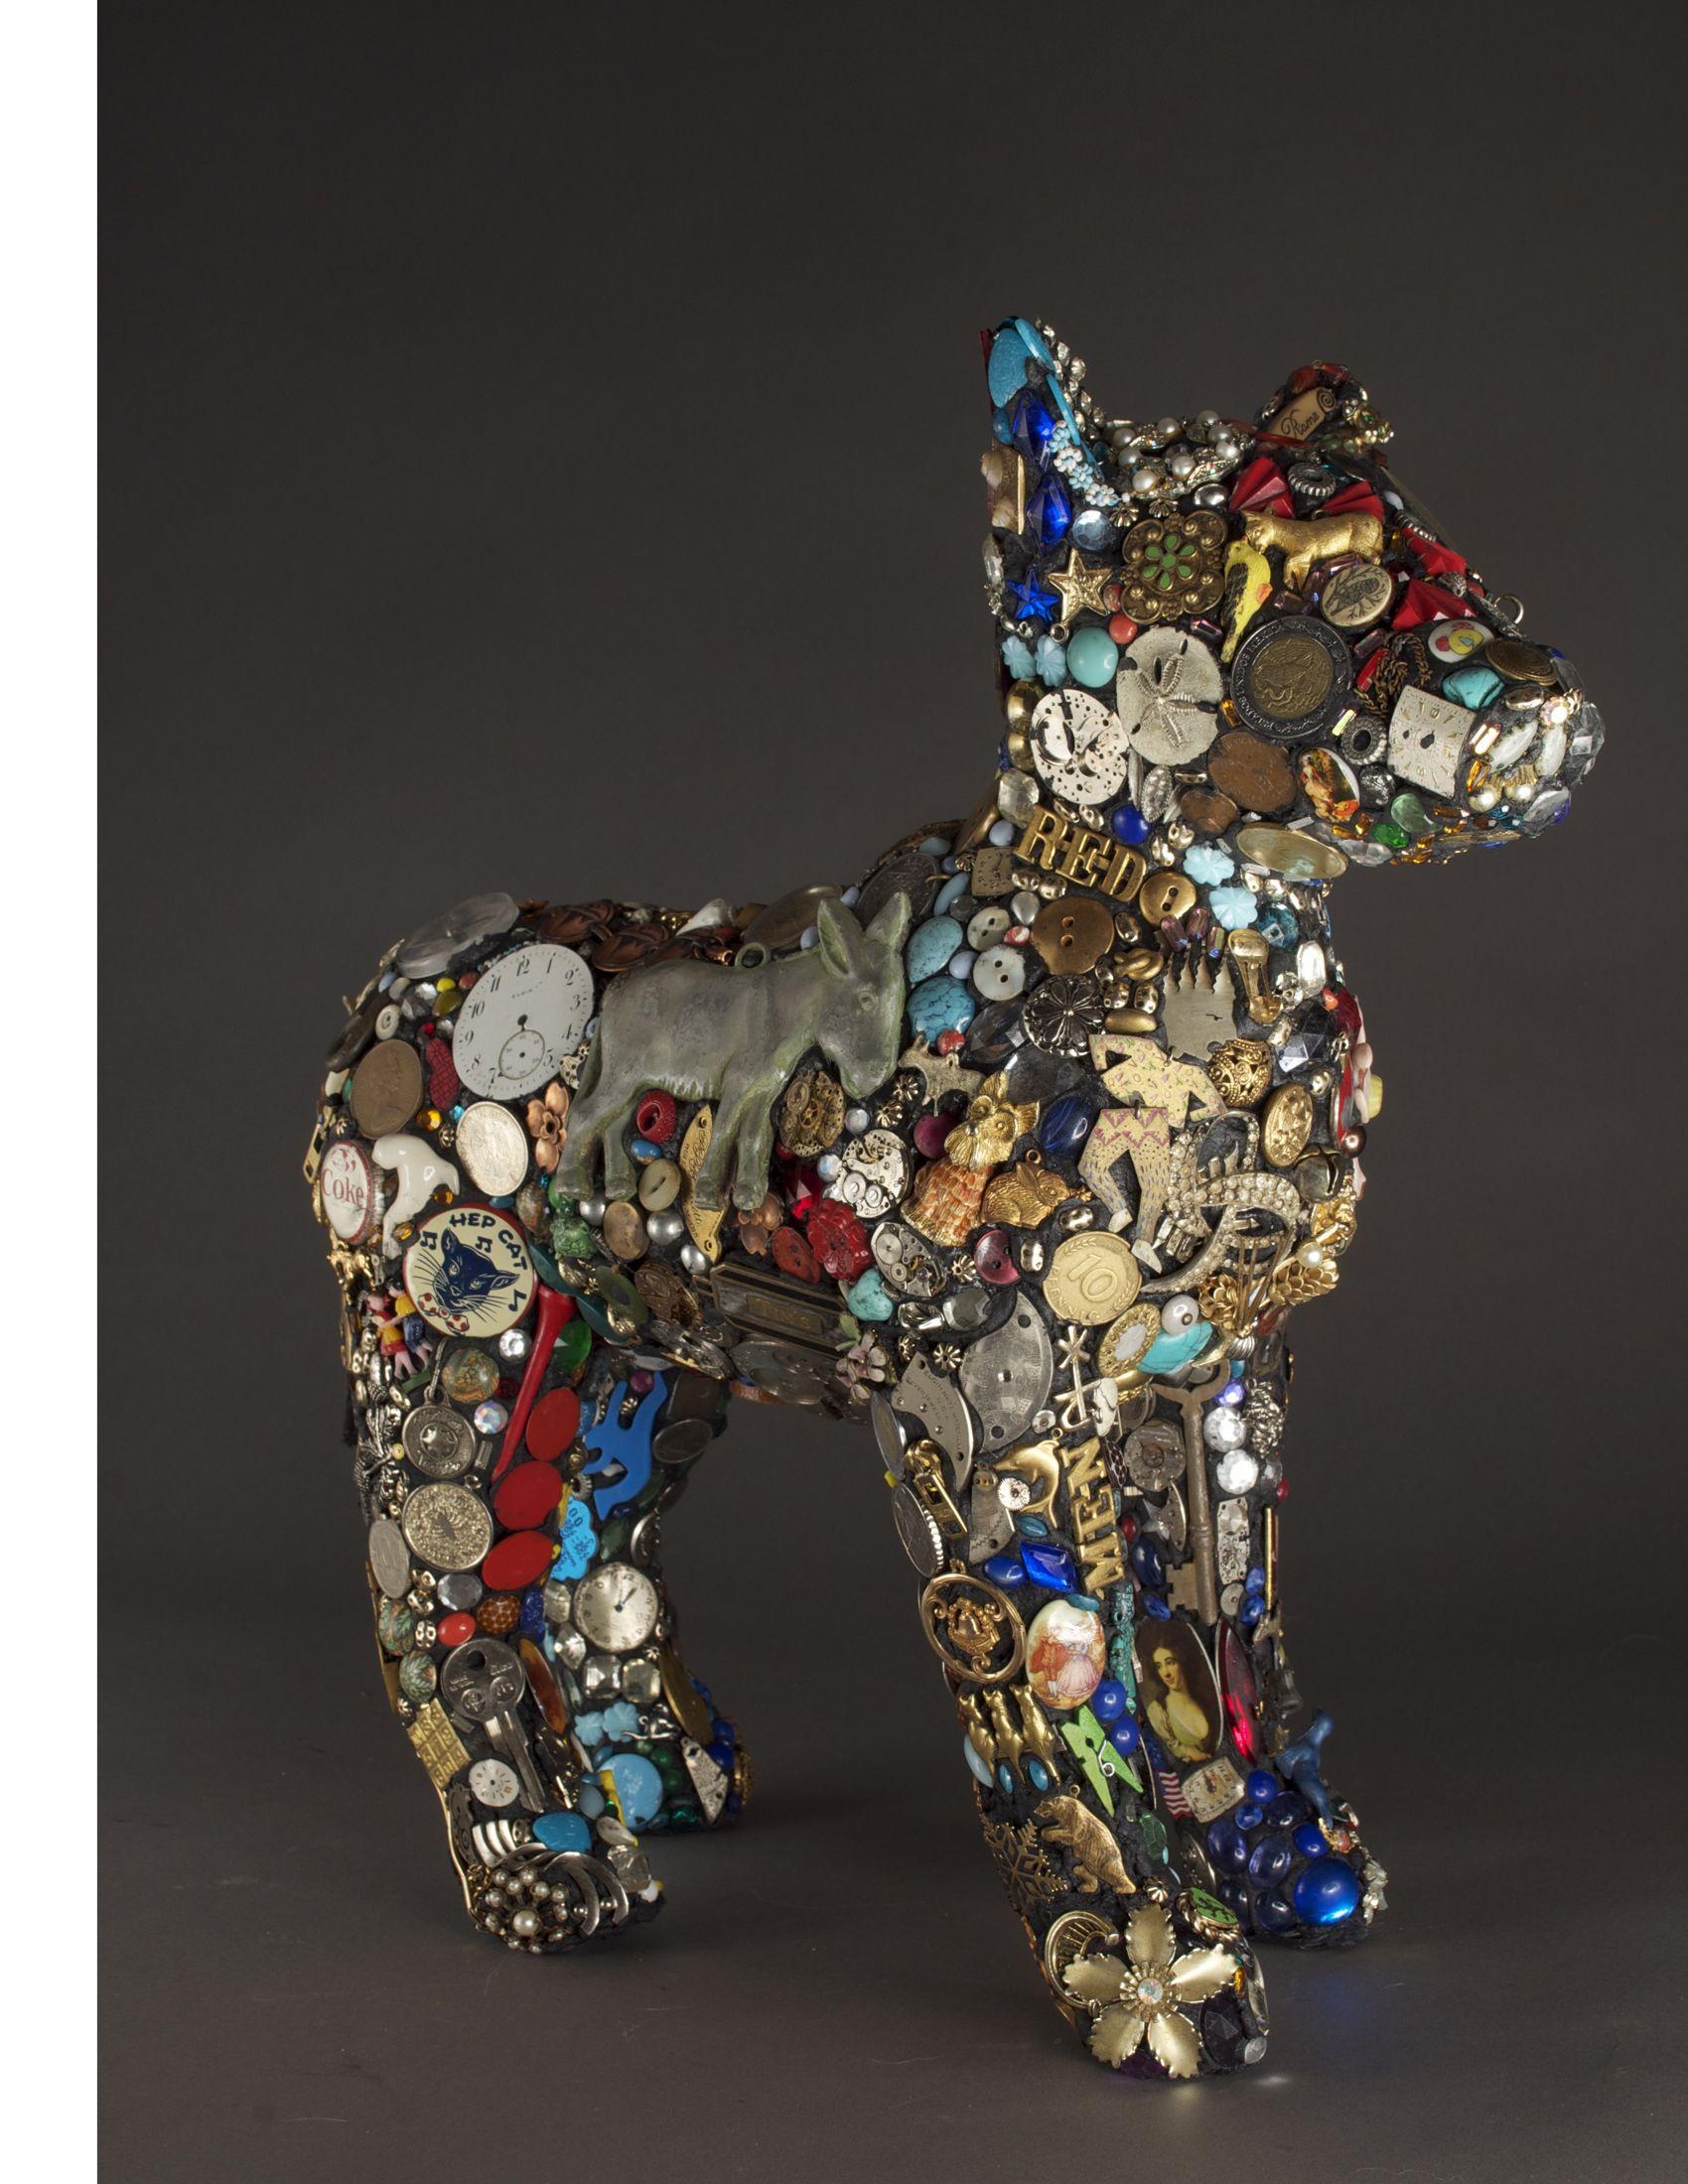 Mary engel jeffrey dog sculpture art mixed media